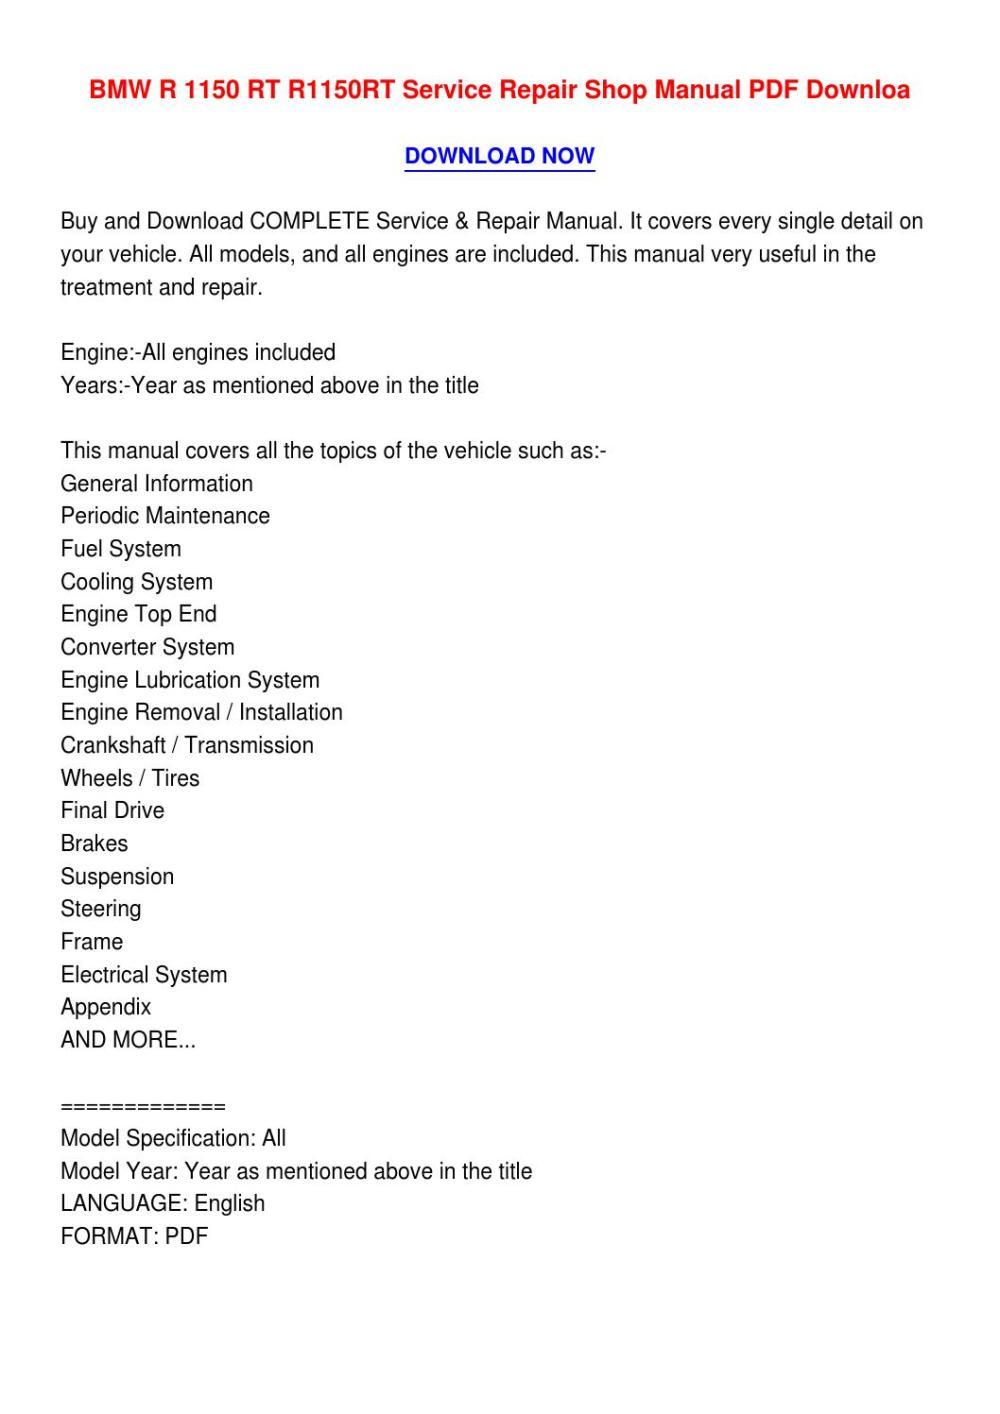 medium resolution of bmw r 1150 rt r1150rt service repair shop manual pdf downloa4 by catherinemonsonvhav issuu